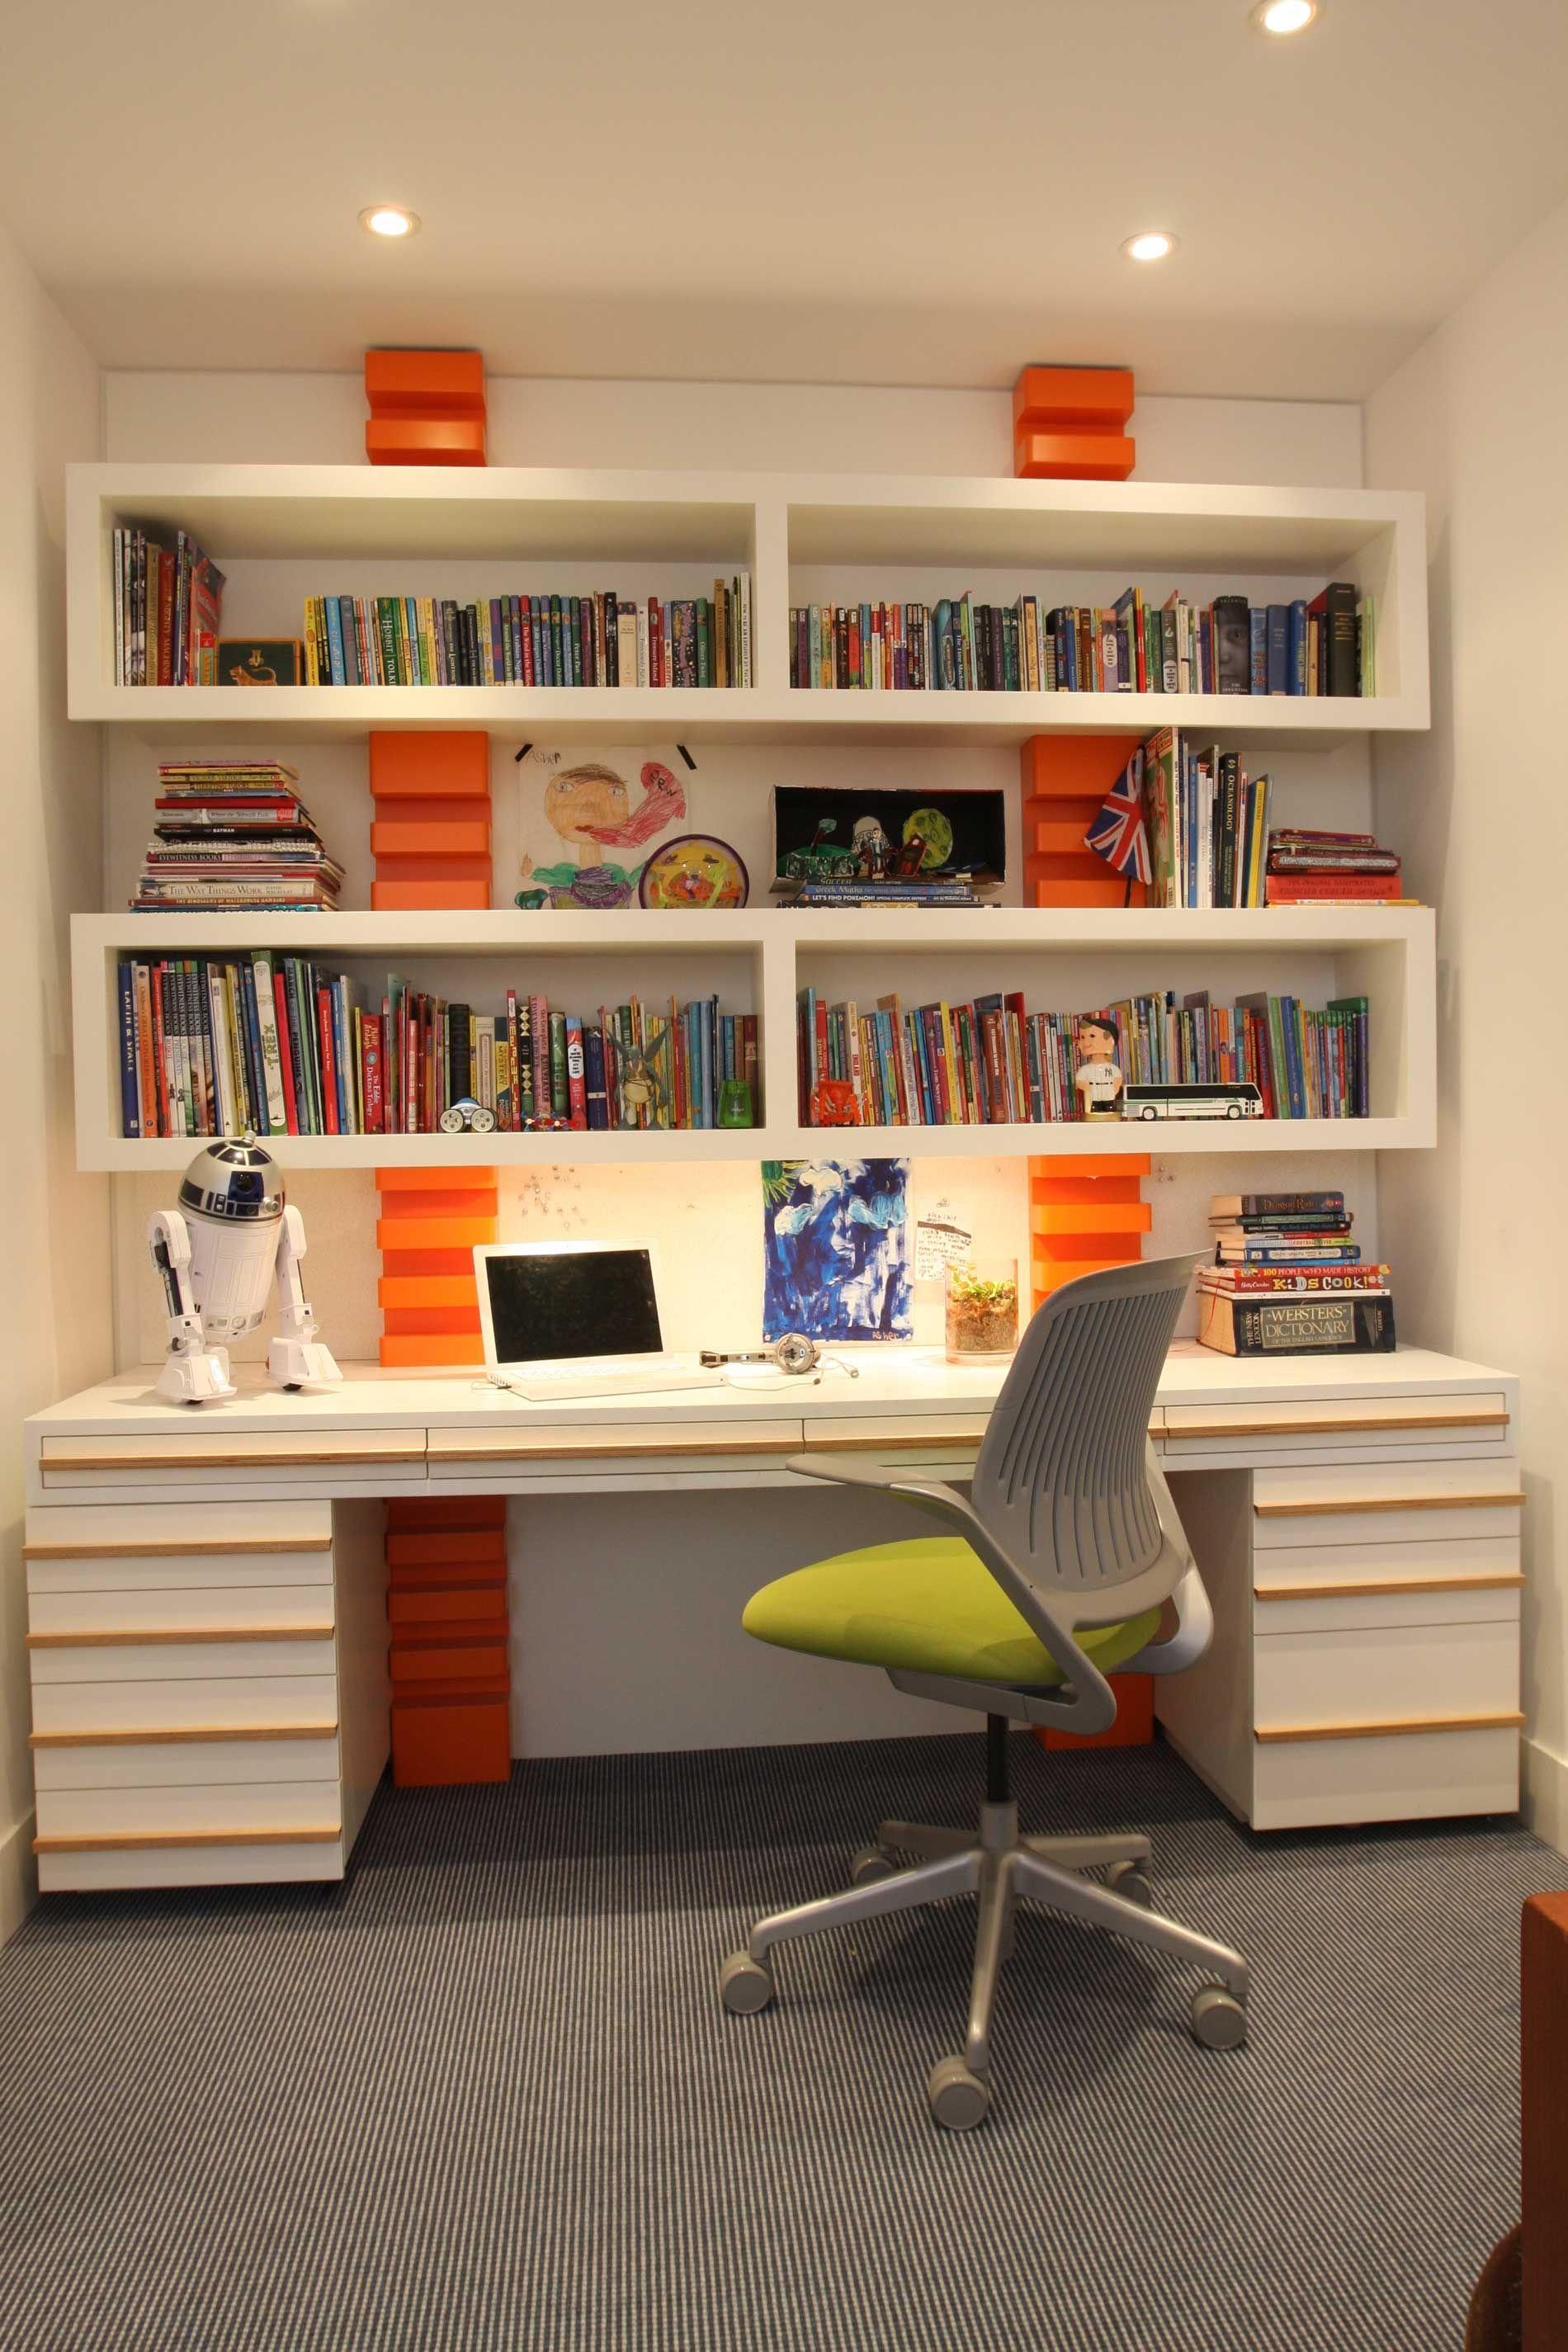 Very Inspiring And Creative Bookshelf Decorating Ideas Living - Book rack designs for bedroom